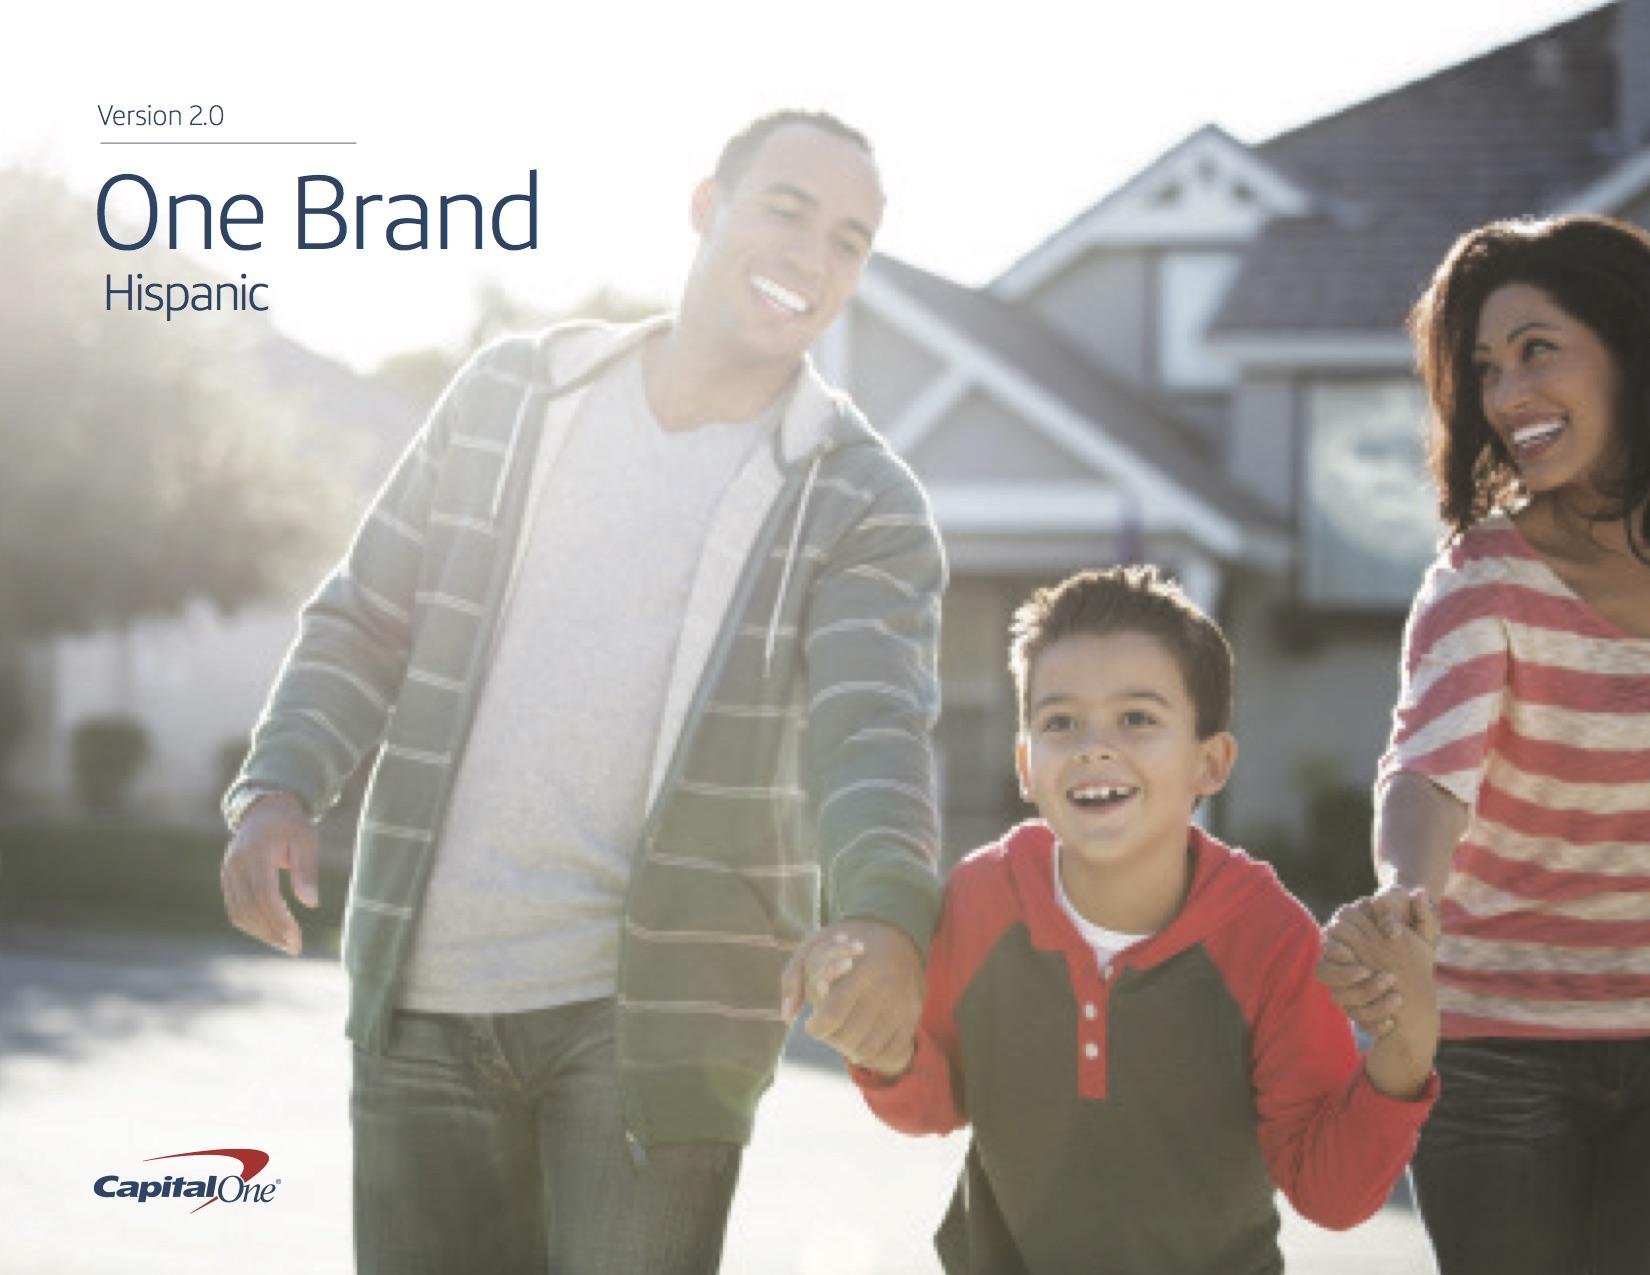 BrandStandards_1.jpg